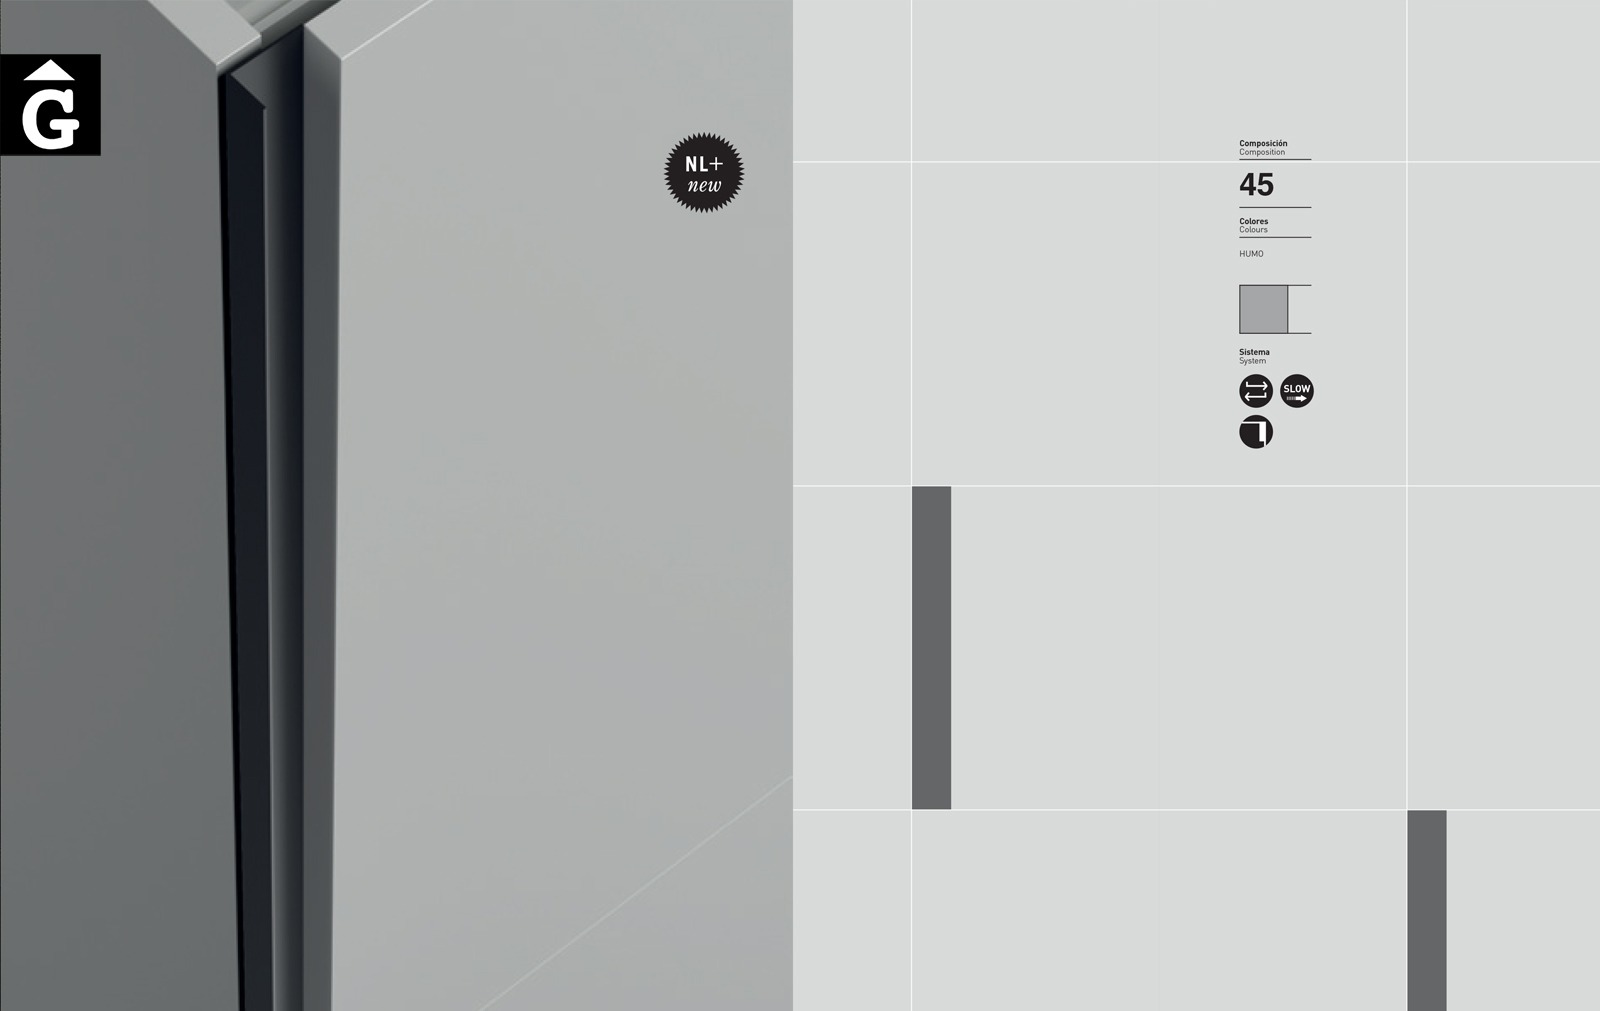 Detall tirador Singular encastat JJP NoLimits by Mobles GIFREU Girona Armaris a mida modern minim elegant atemporal